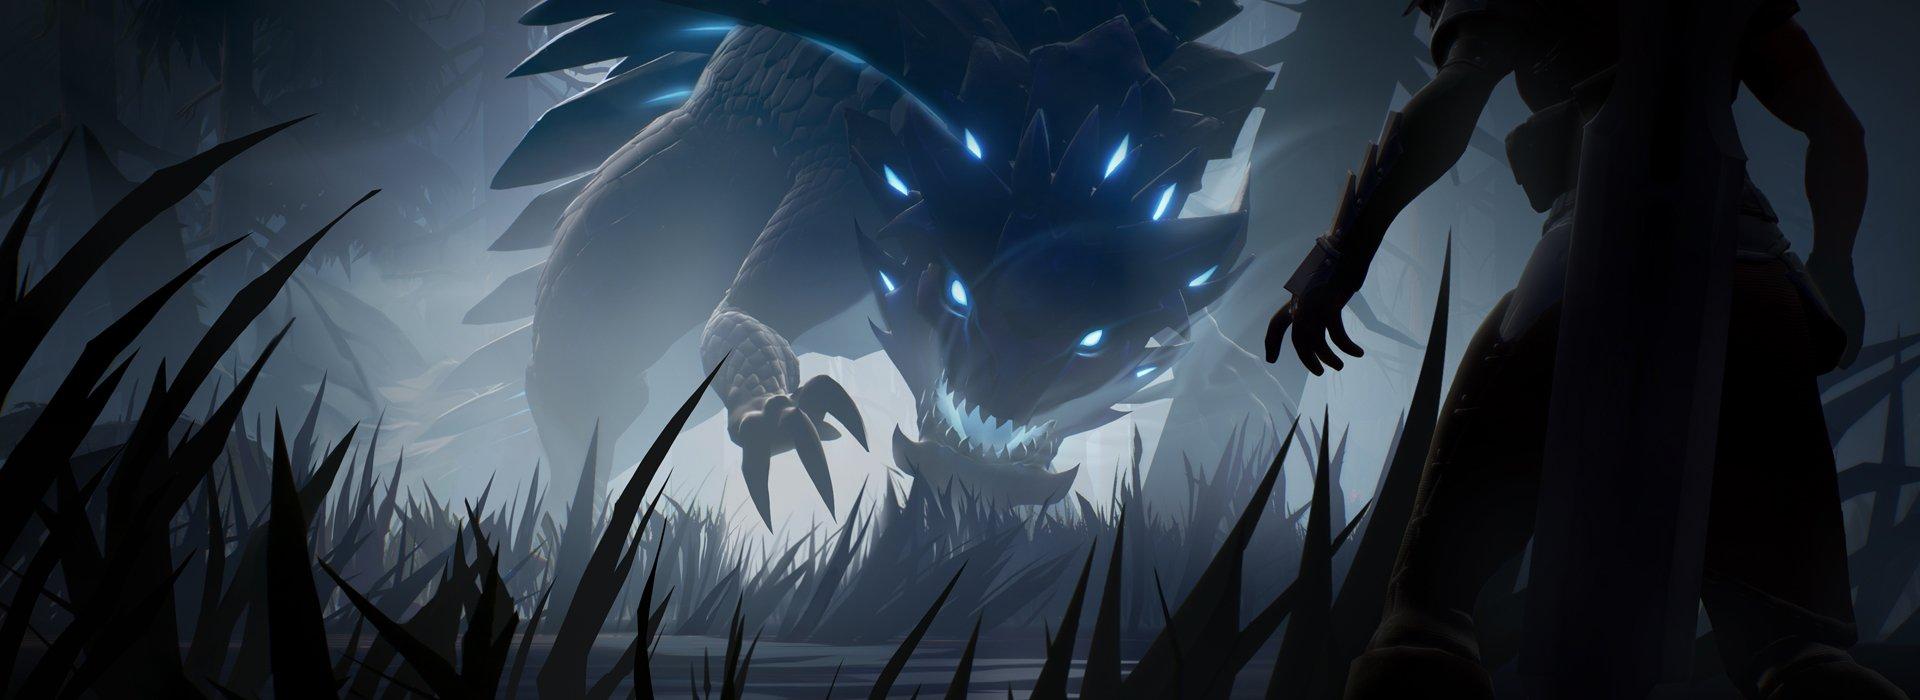 Dauntless Alpha Impressions | A behemoth undertaking